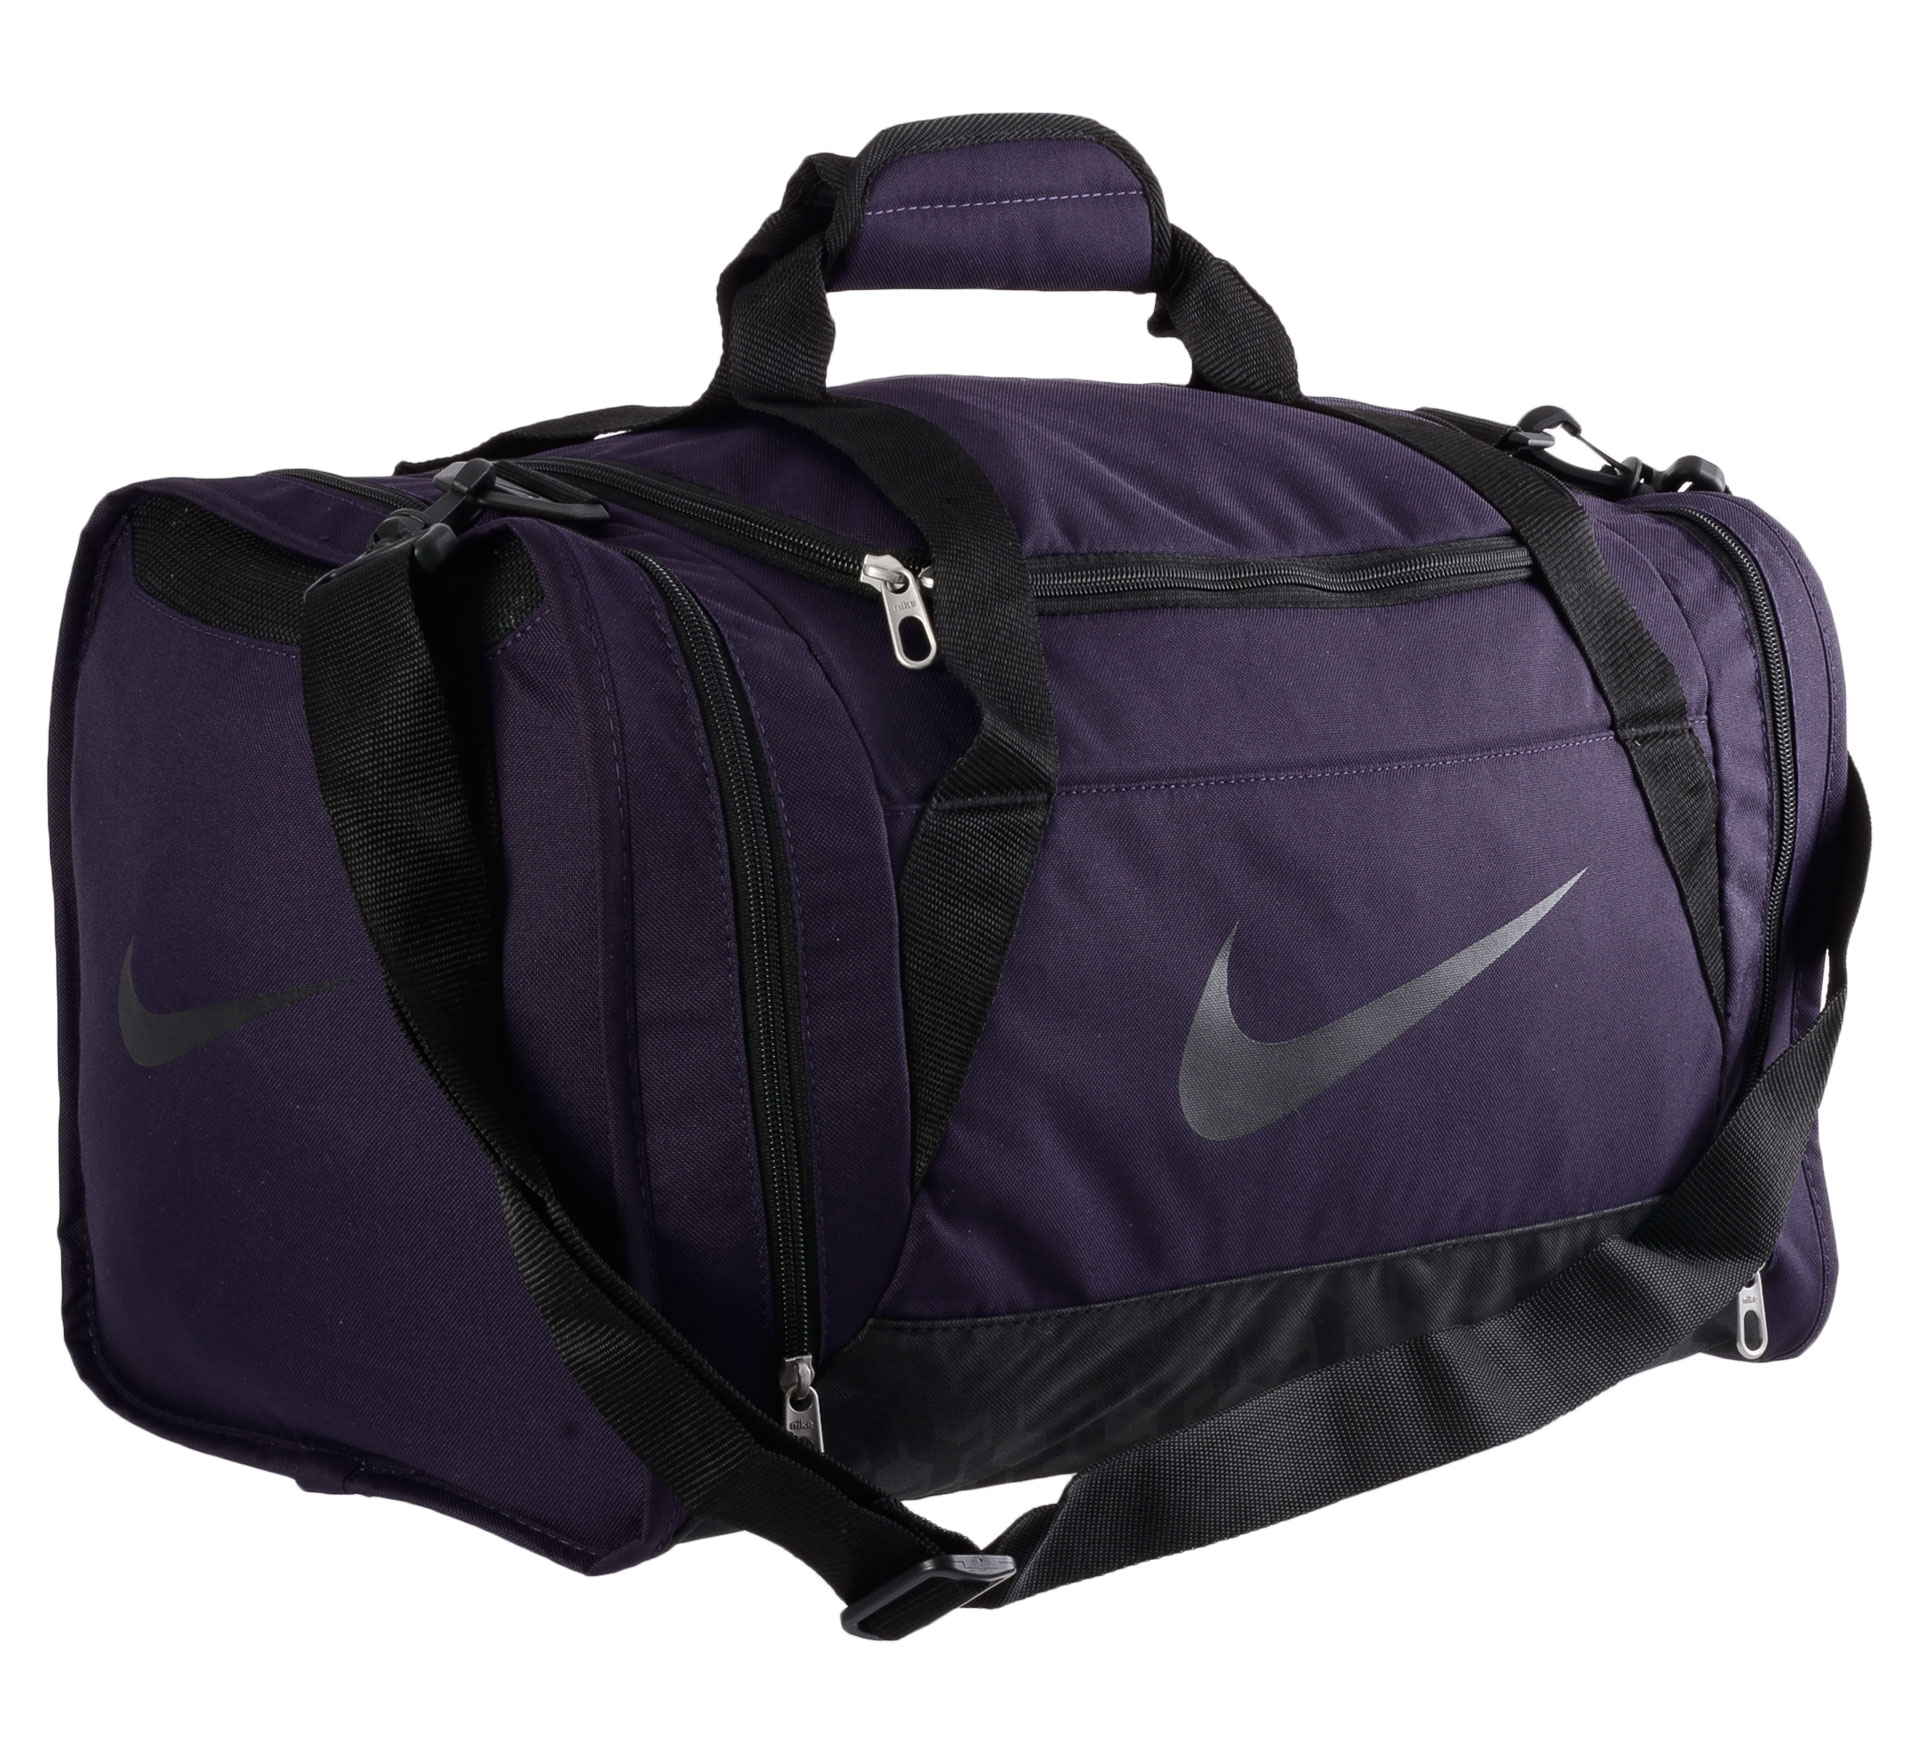 Nike Brasilia 6 Duffel Sports Bag Small donker paars - zwart